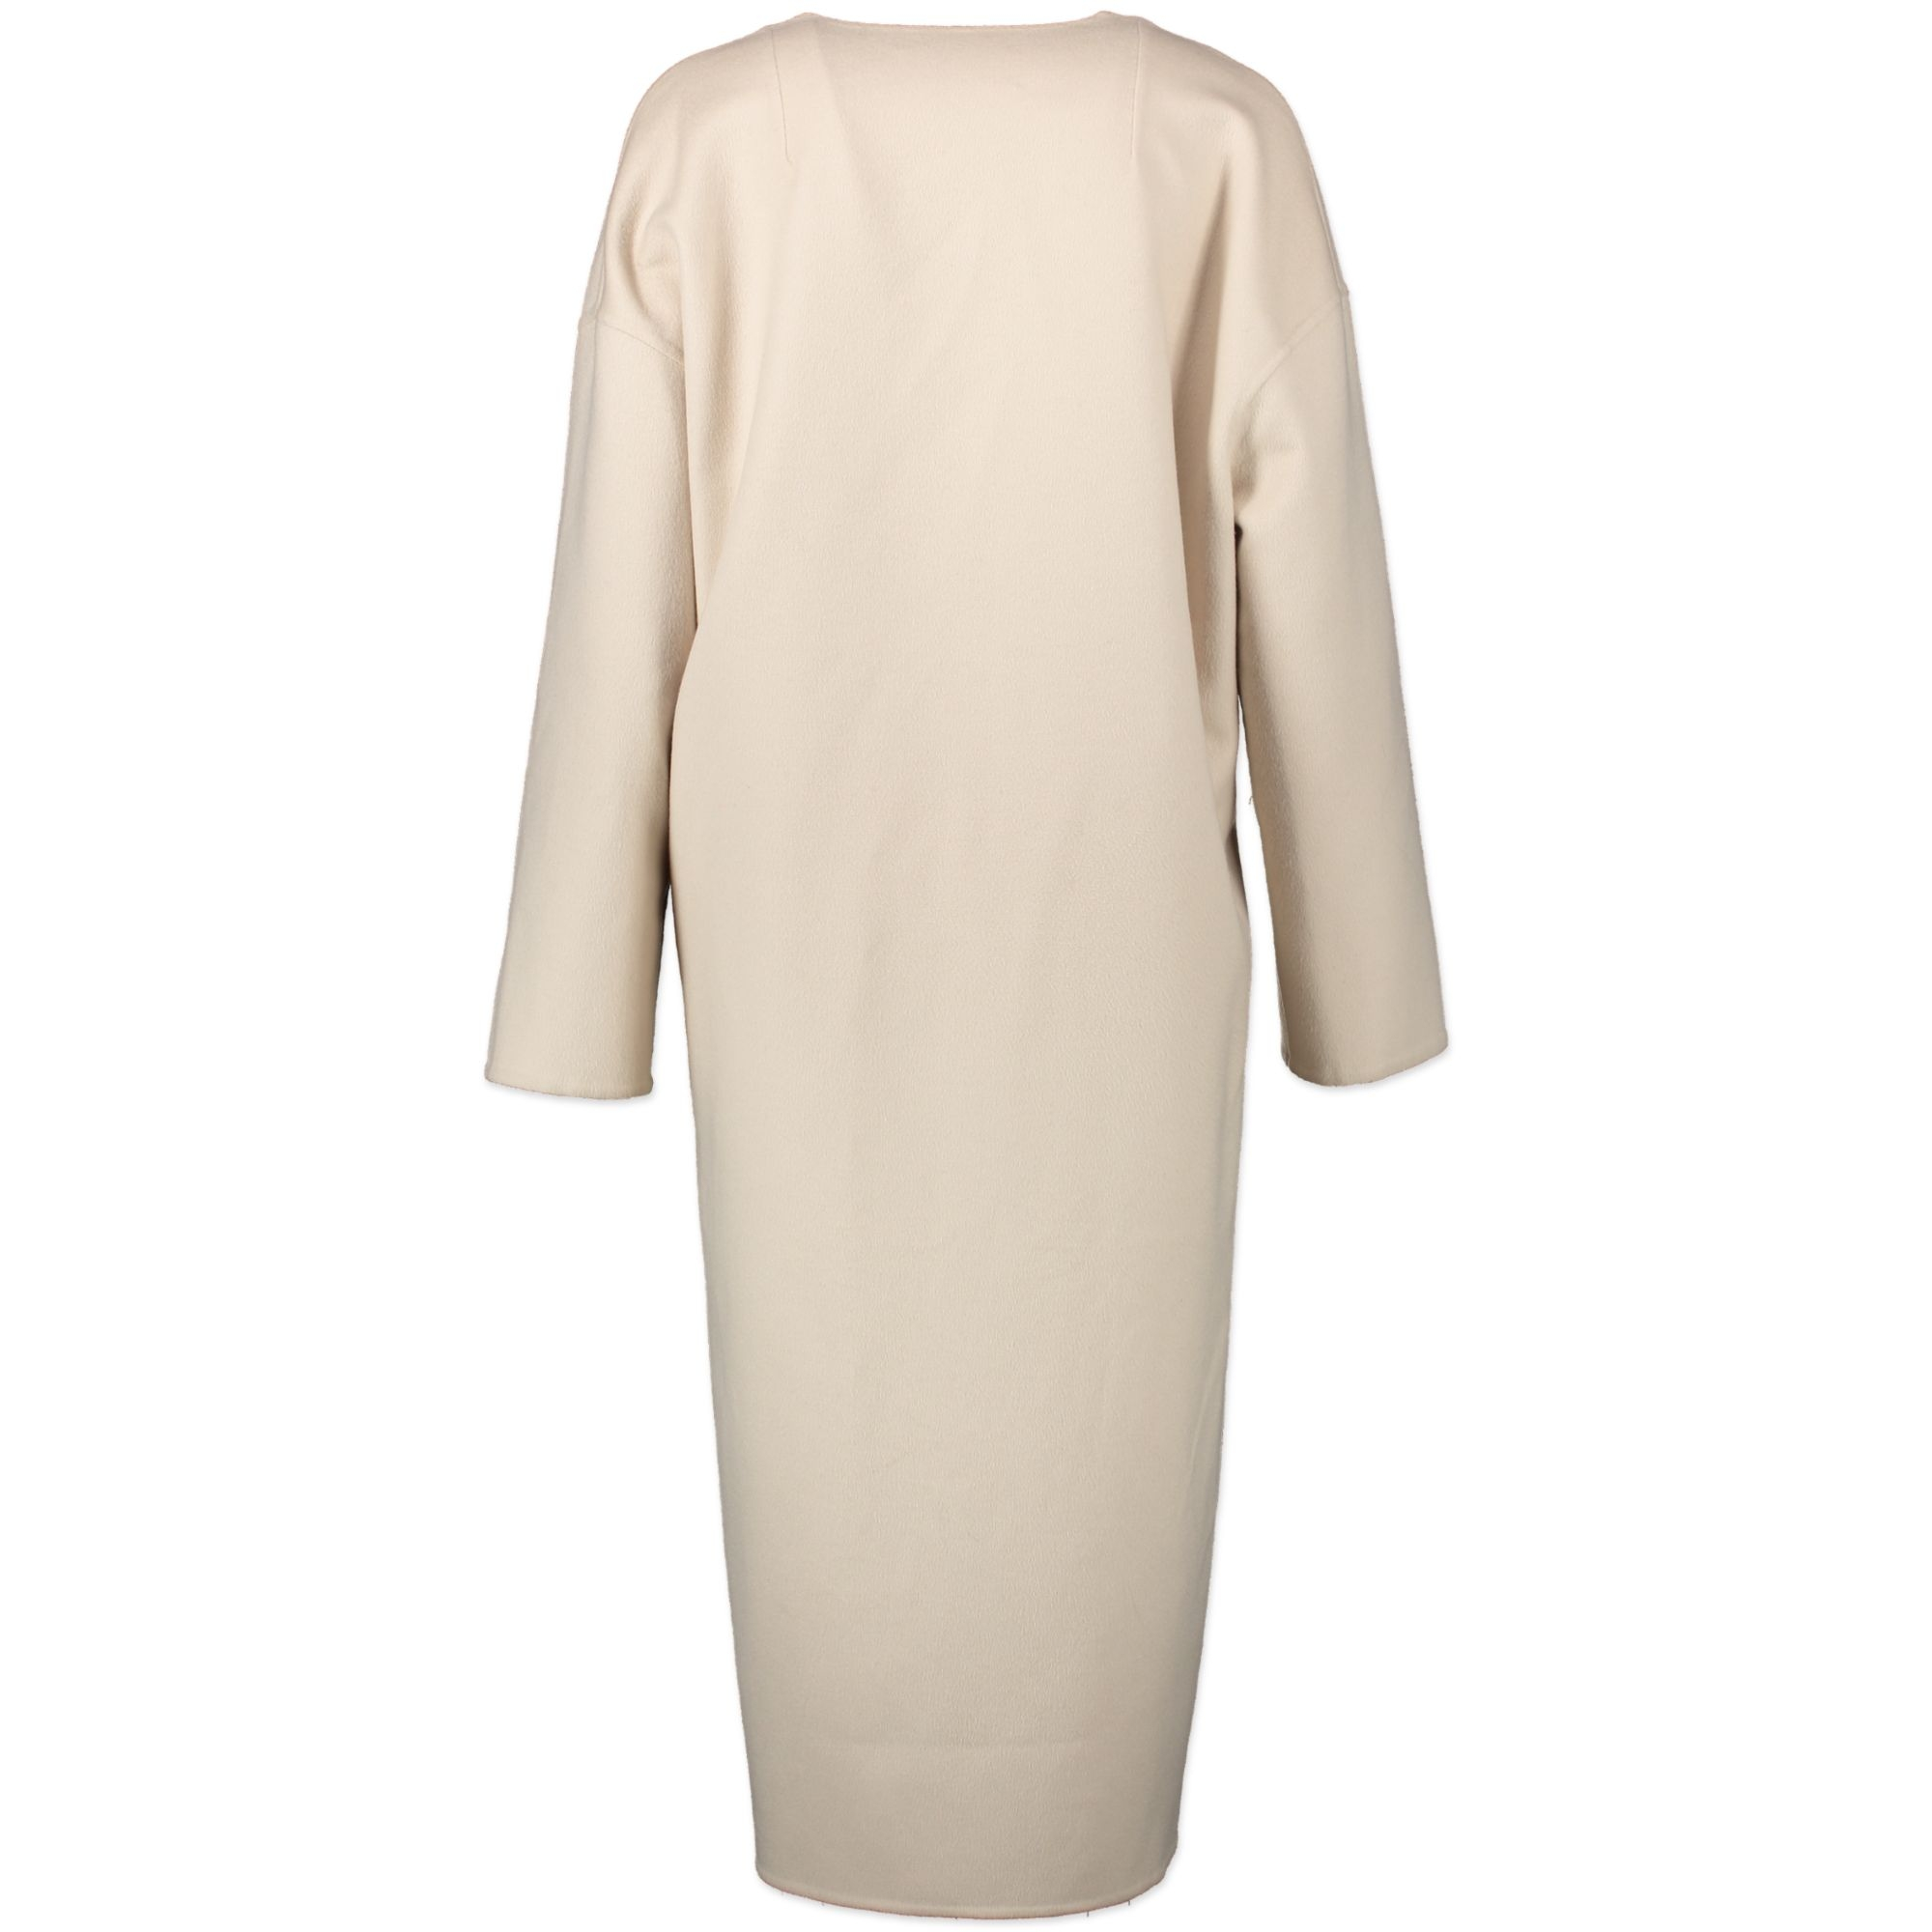 Loewe Light Beige Wool and Cashmere Coat